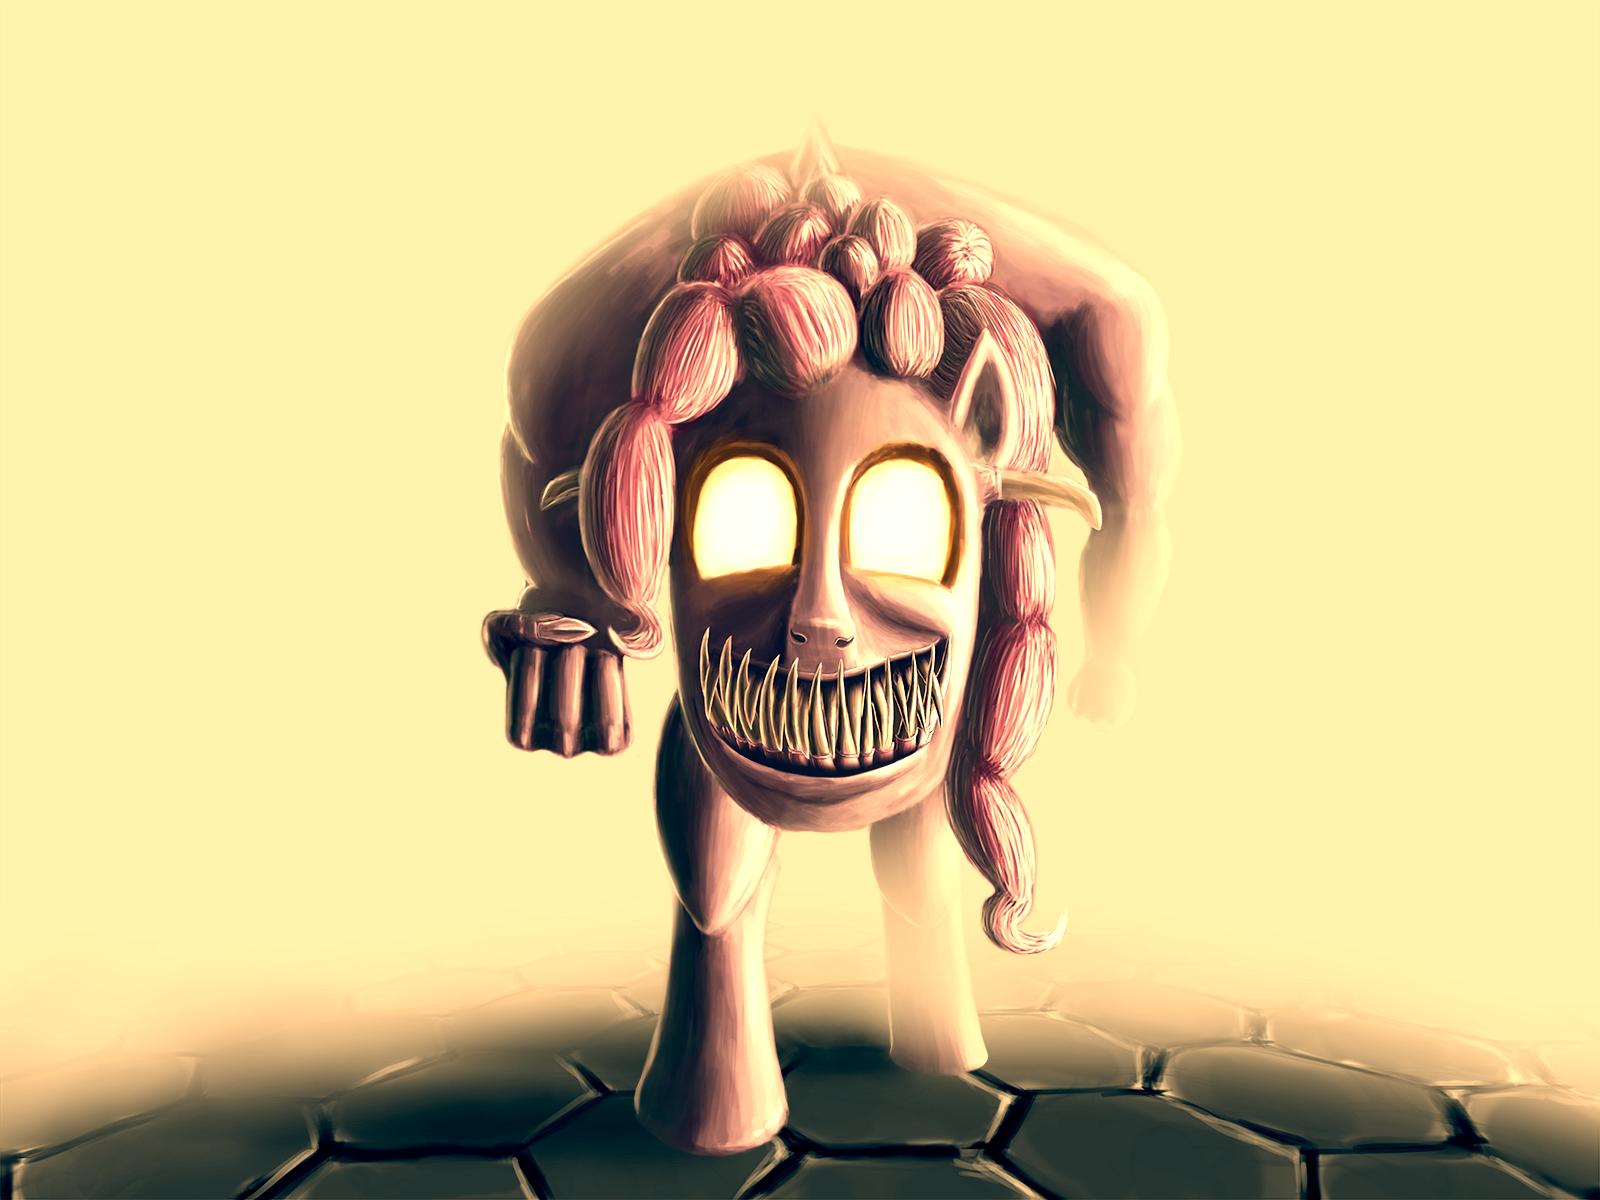 Pinkie Demon by DorkyDoughnut